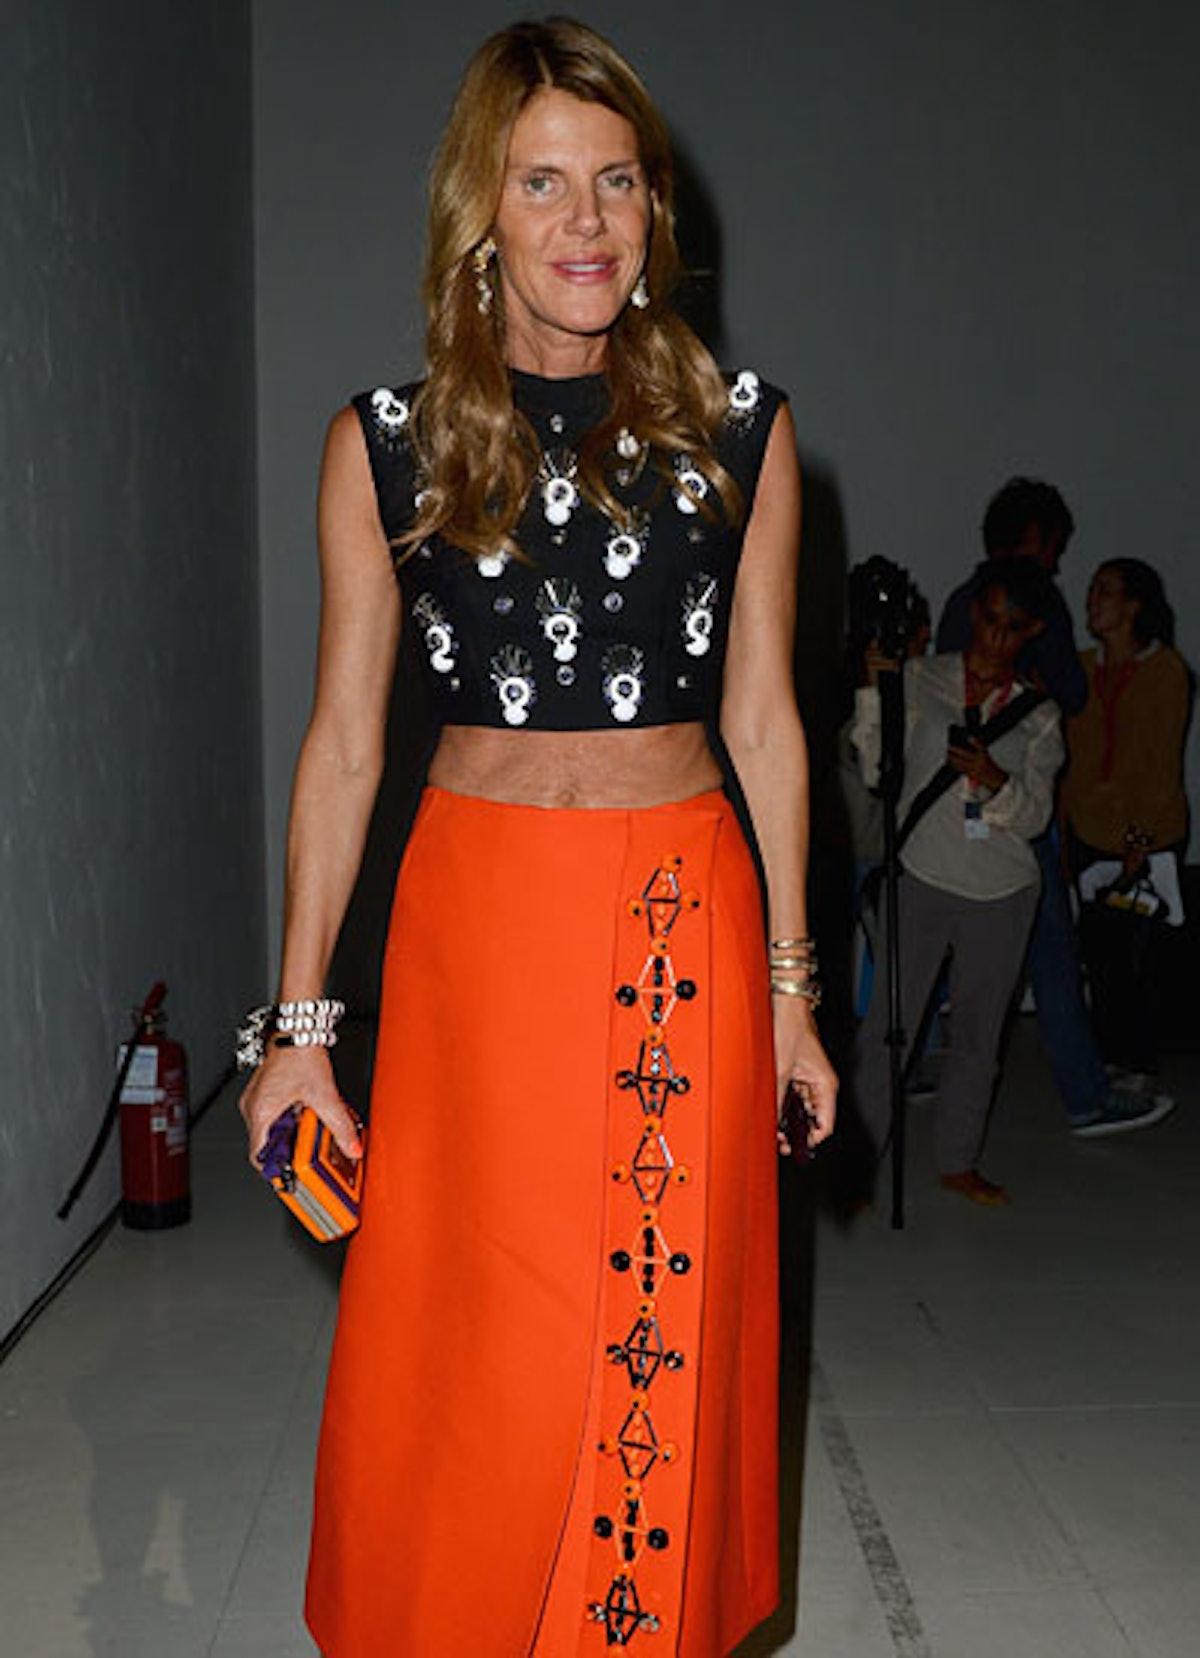 fass-bare-midriff-celebrity-fashion-03-v.jpg